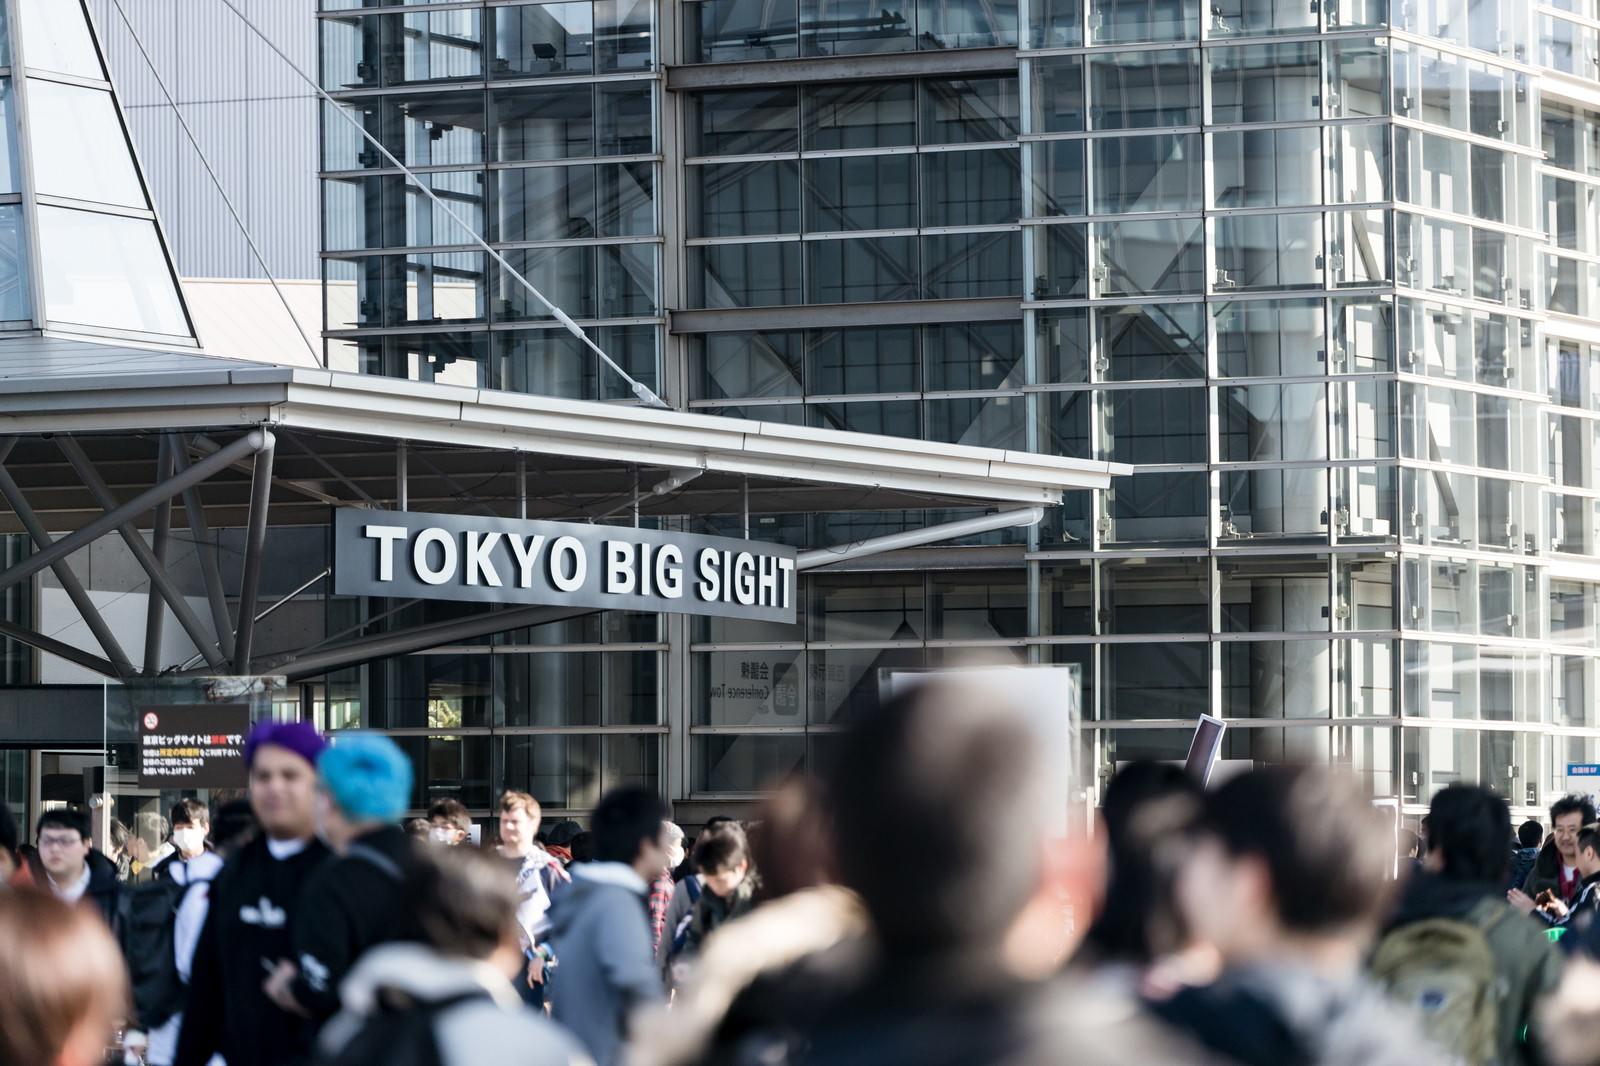 「TOKYO BIG SIGHT の入り口」の写真